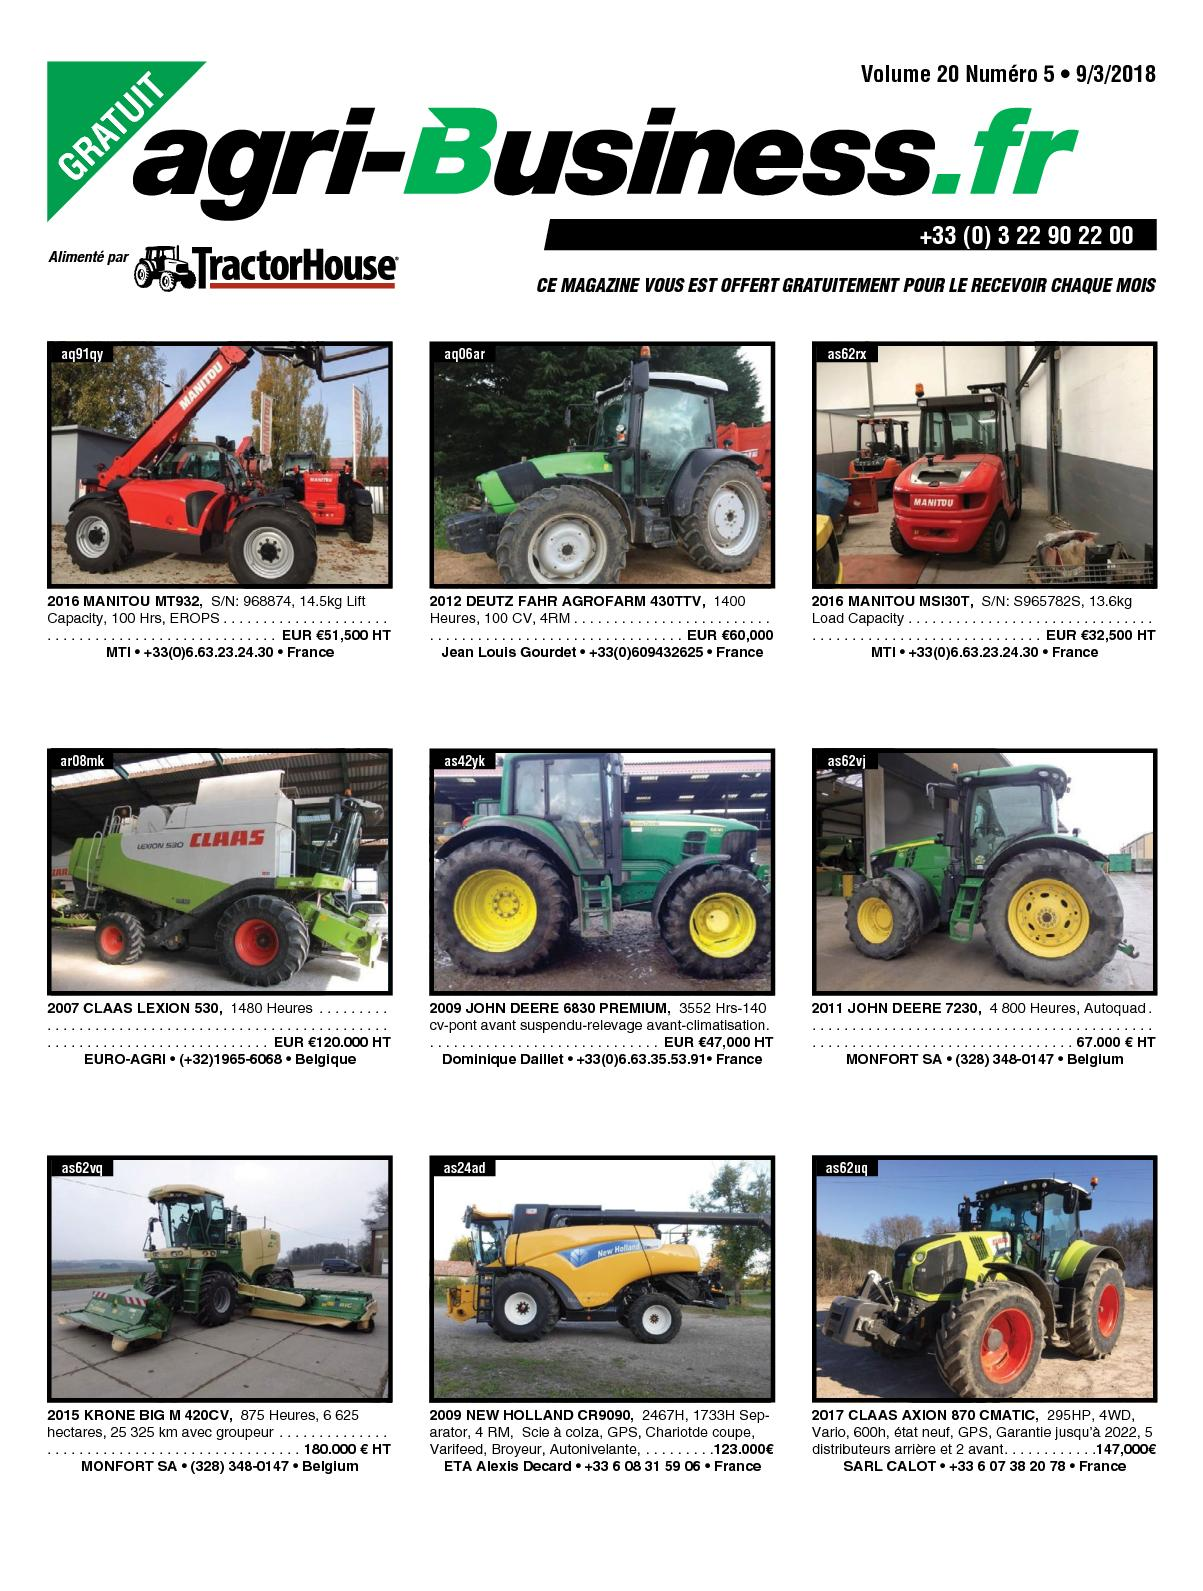 Calamo agri business volume 20 numro 05 09032018 fandeluxe Image collections